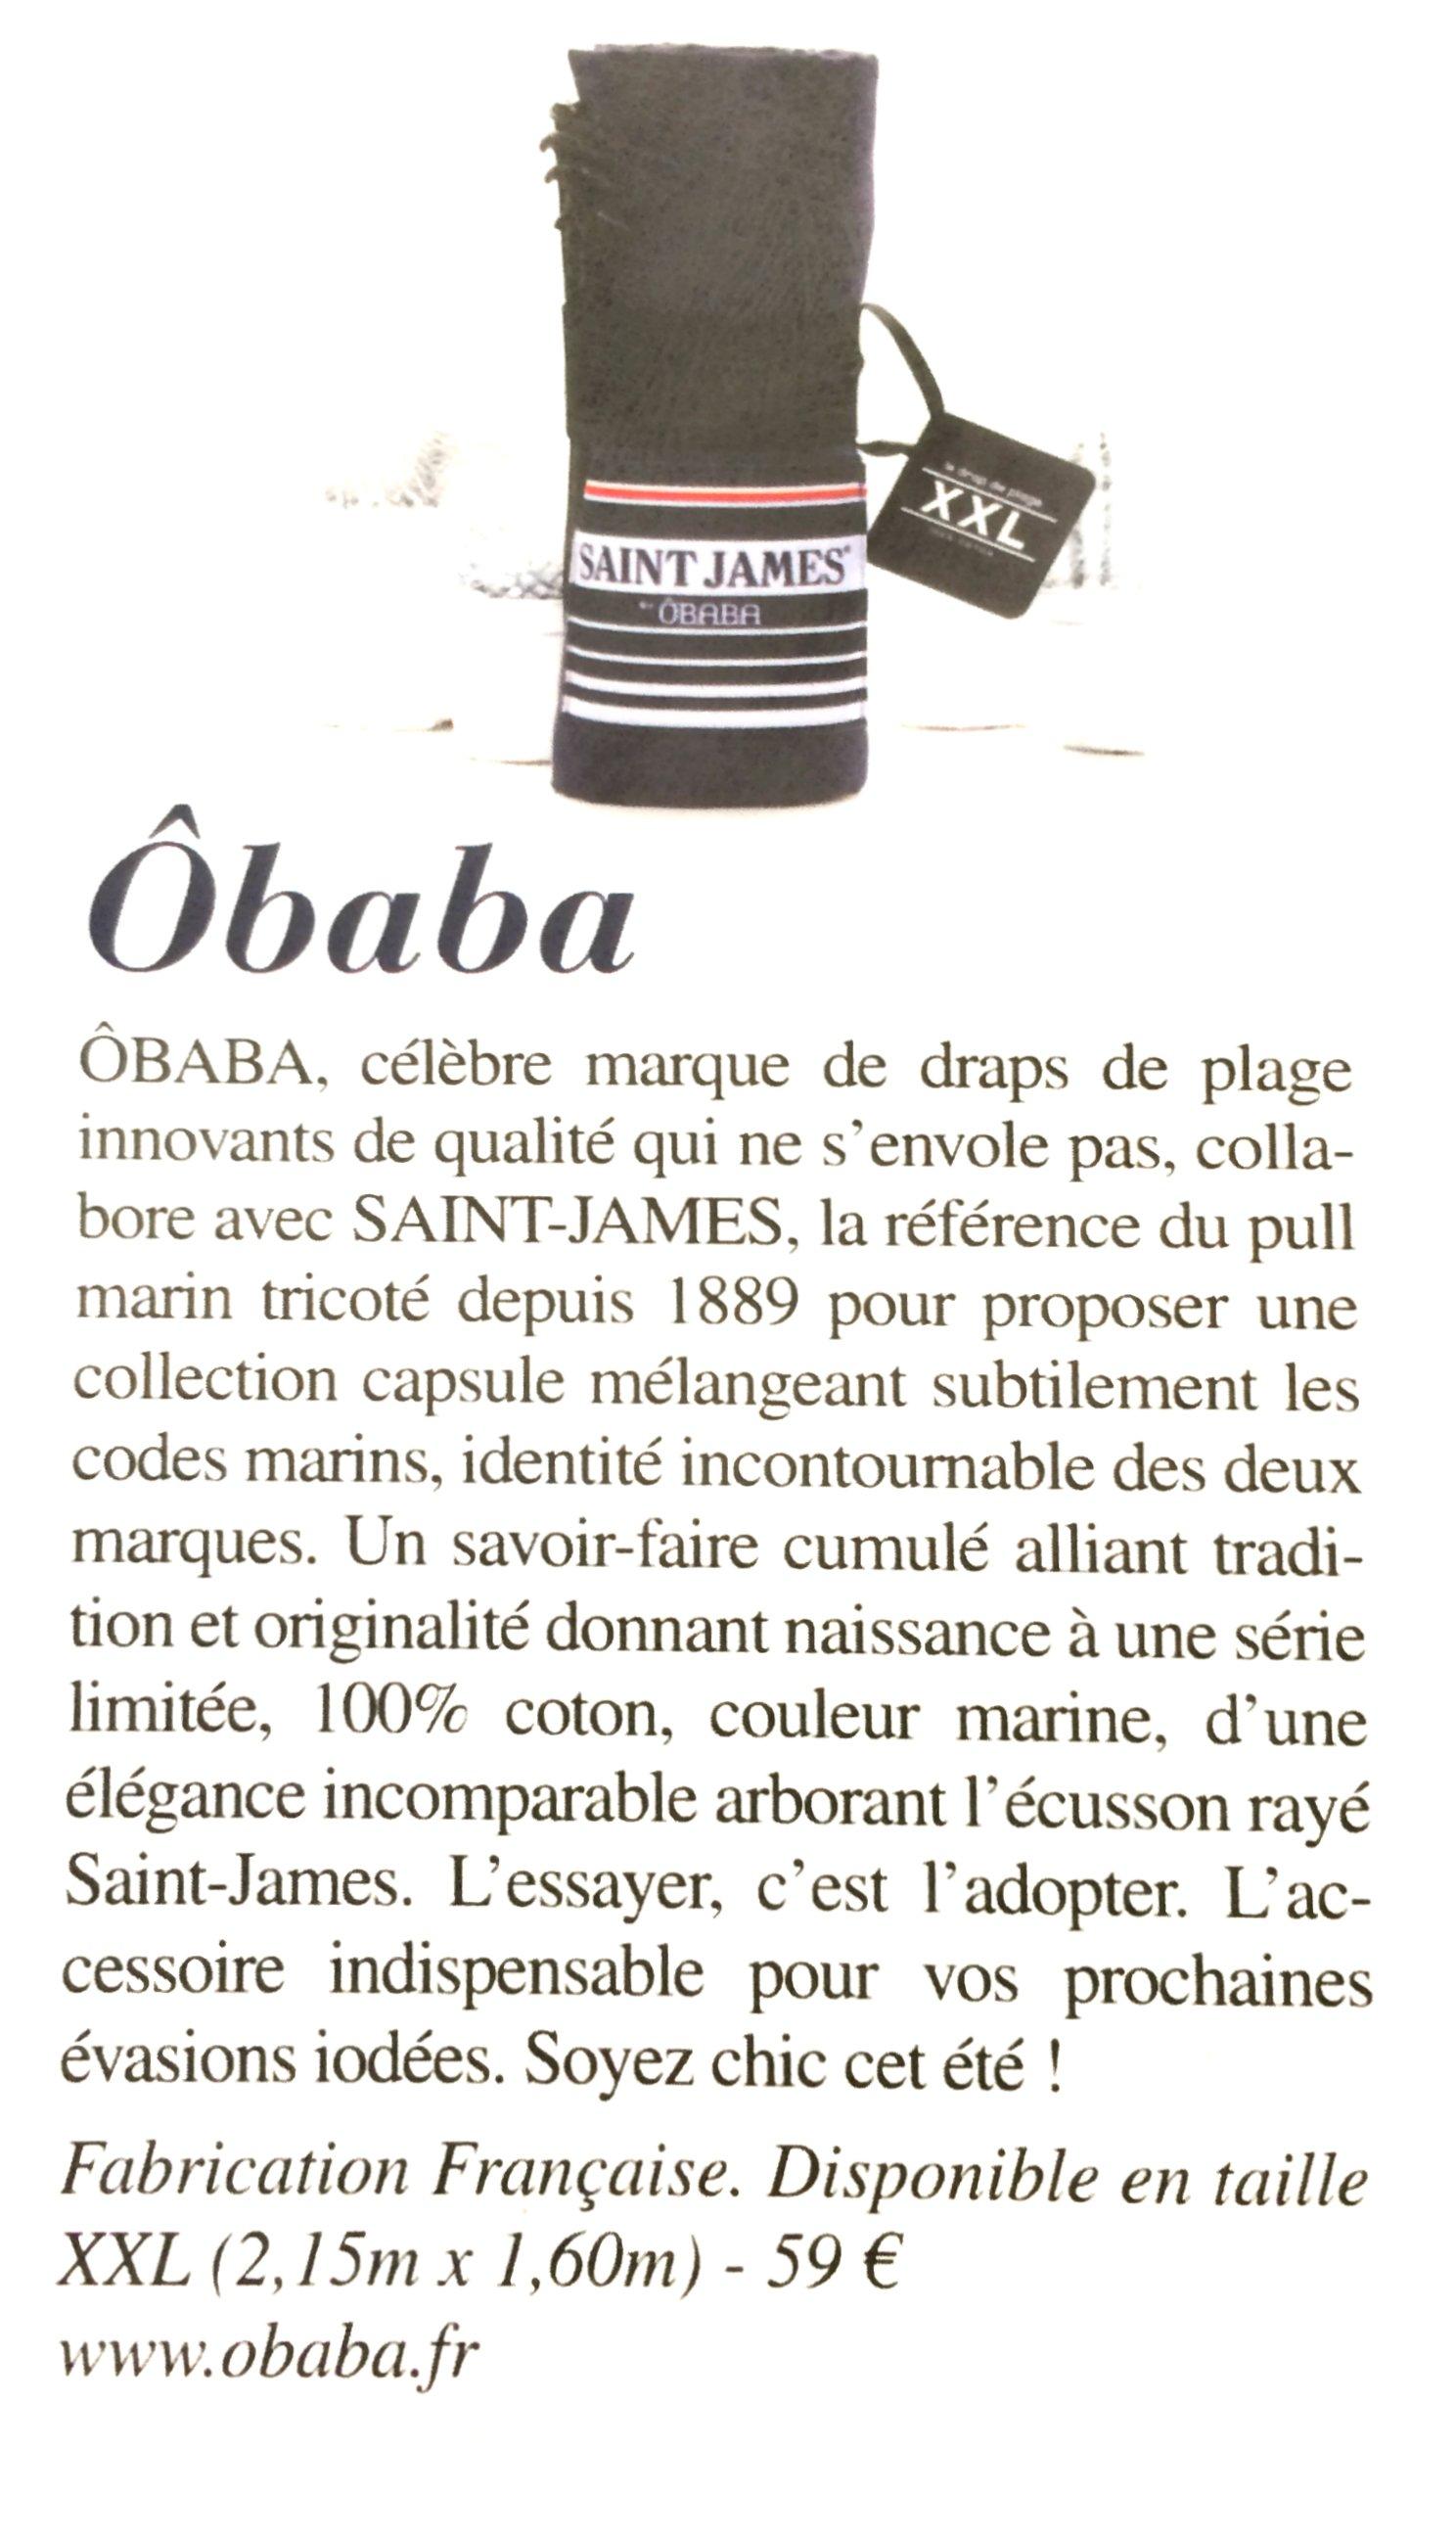 gala-magazine-paris-mai-17